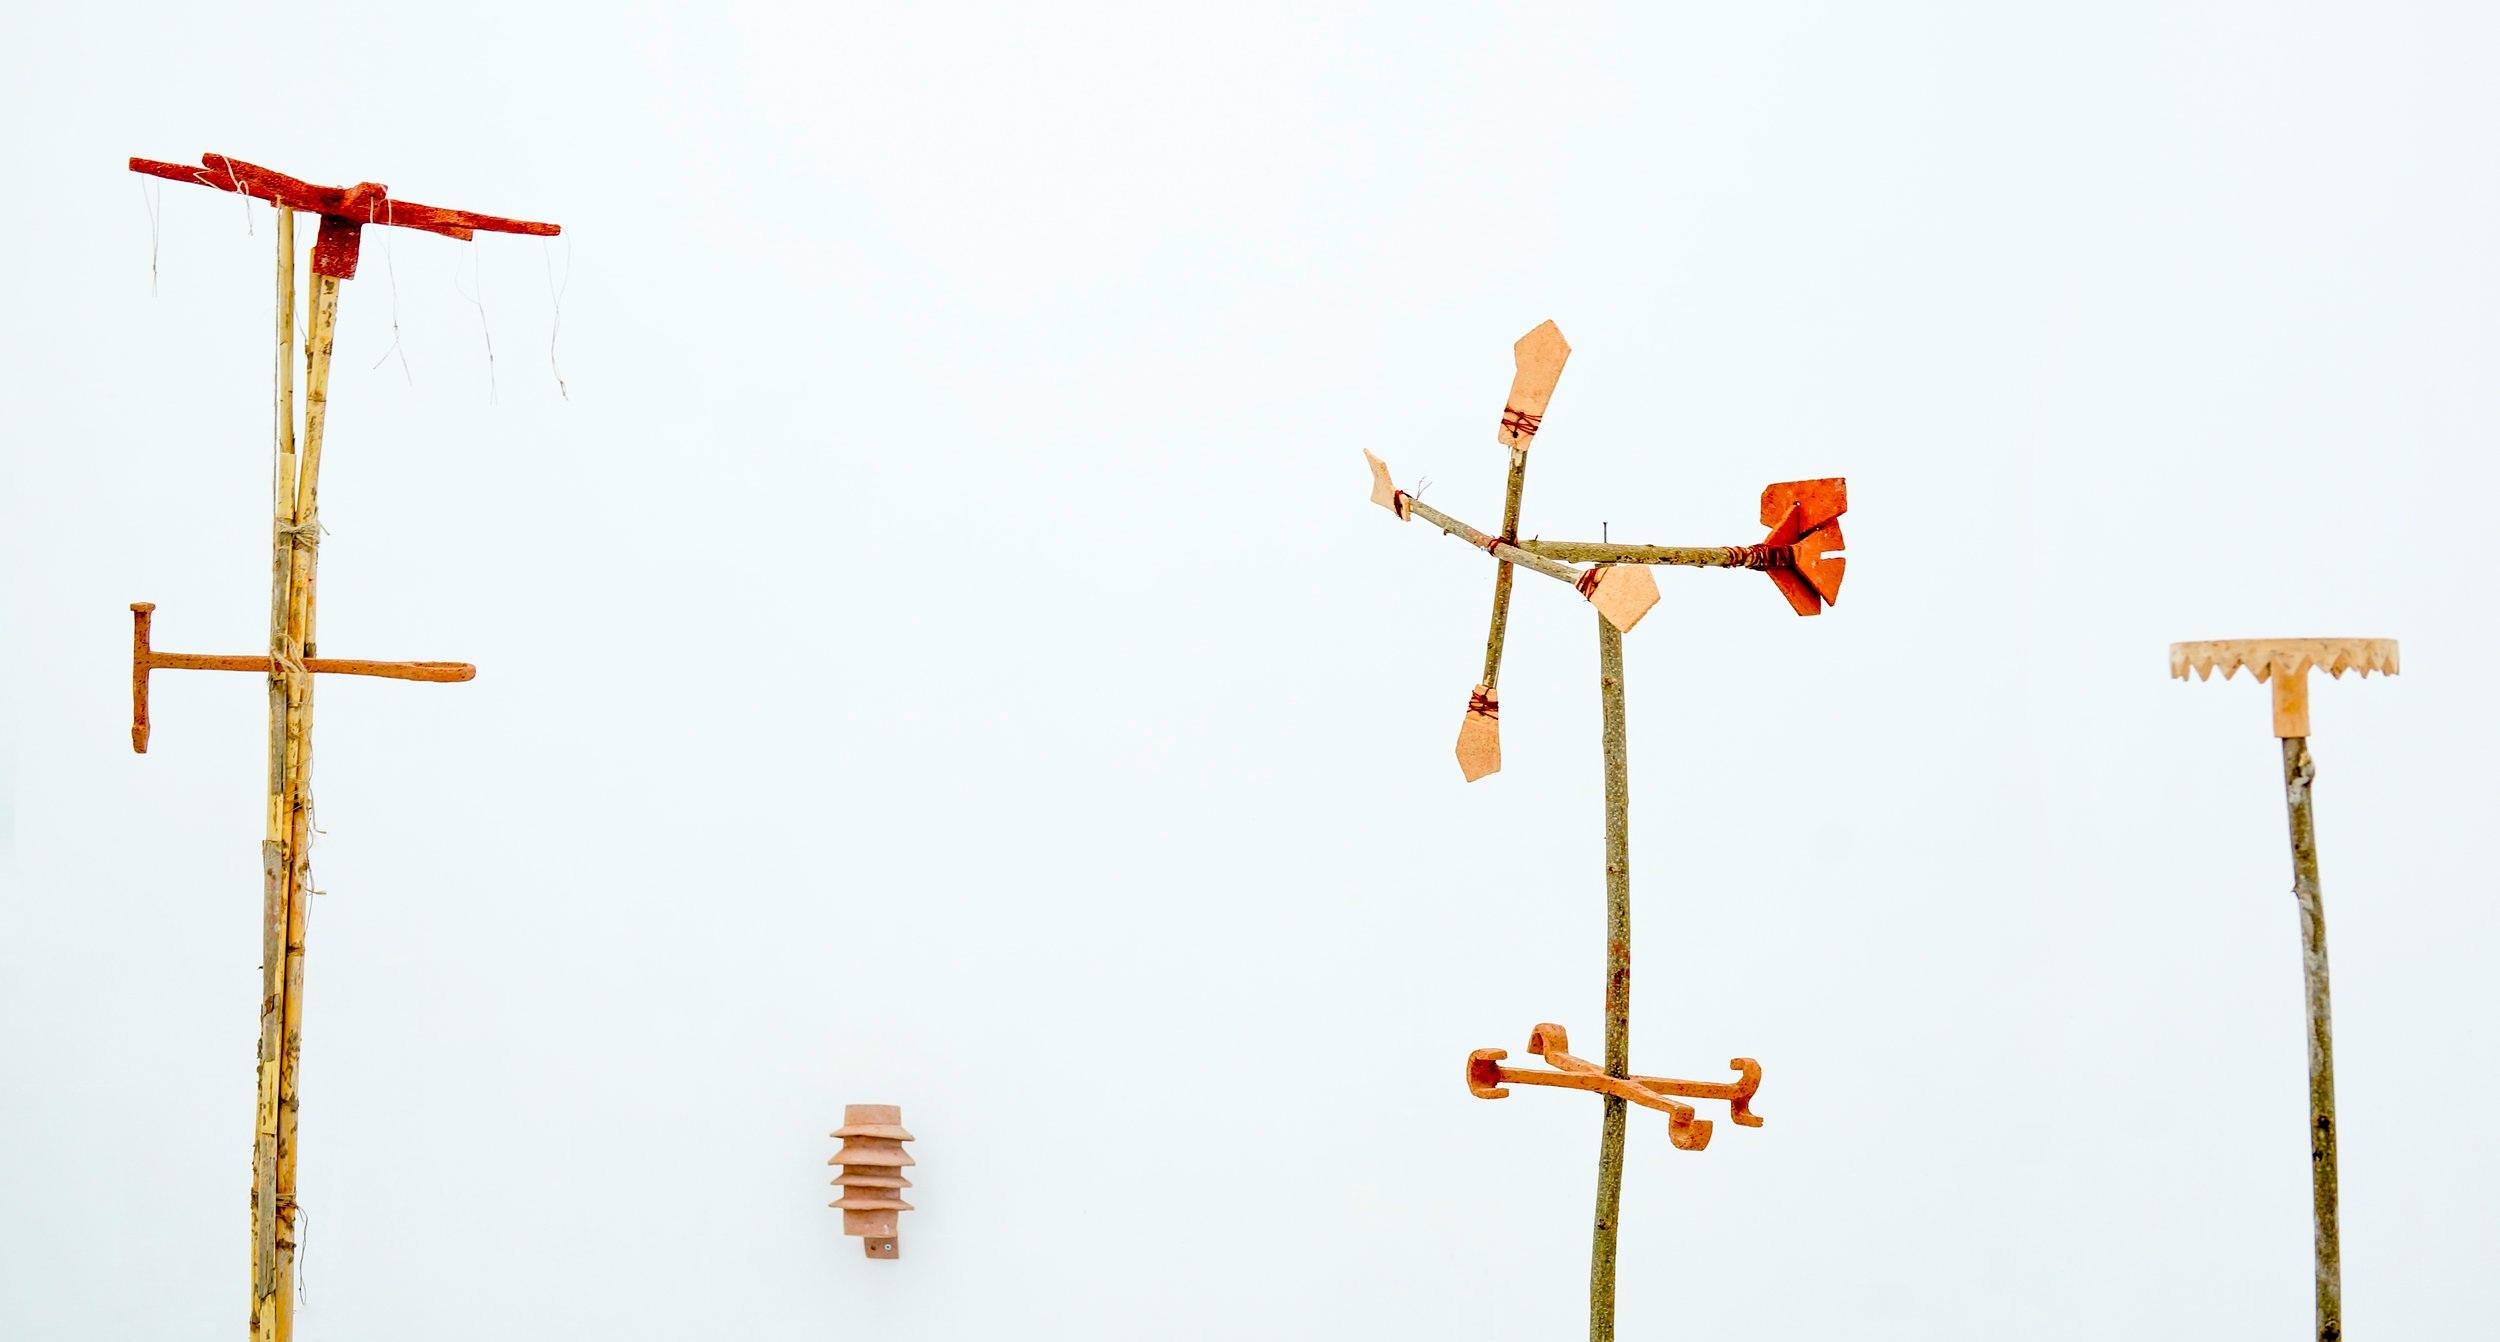 Maja+Escher+-Ensaio+Quatro+Ventos - Otoco